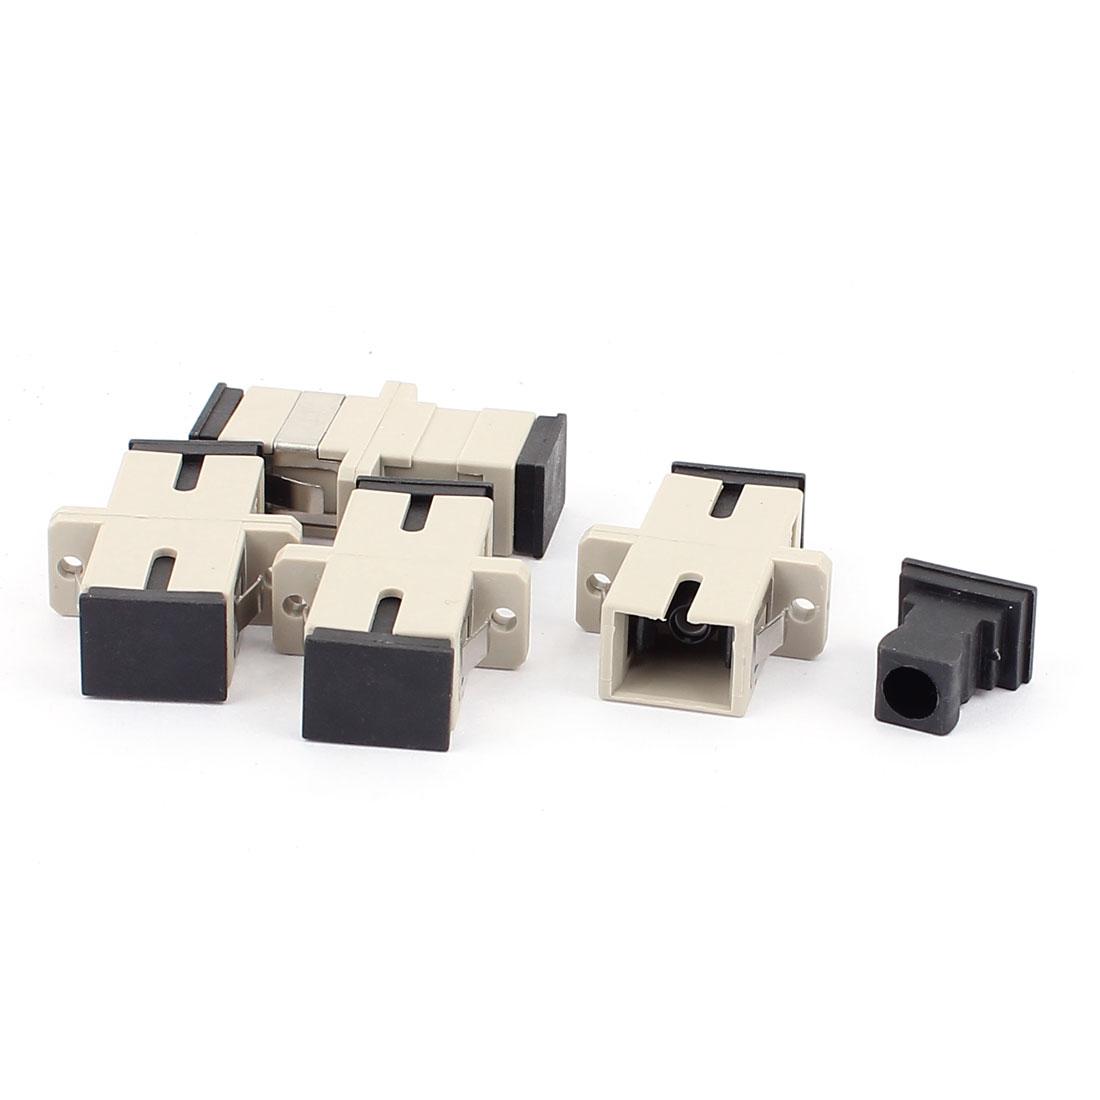 4 Pcs Single-mode SC-SC UPC Simplex Fibre Couplers Flange Adapters Optical Fiber Connectors